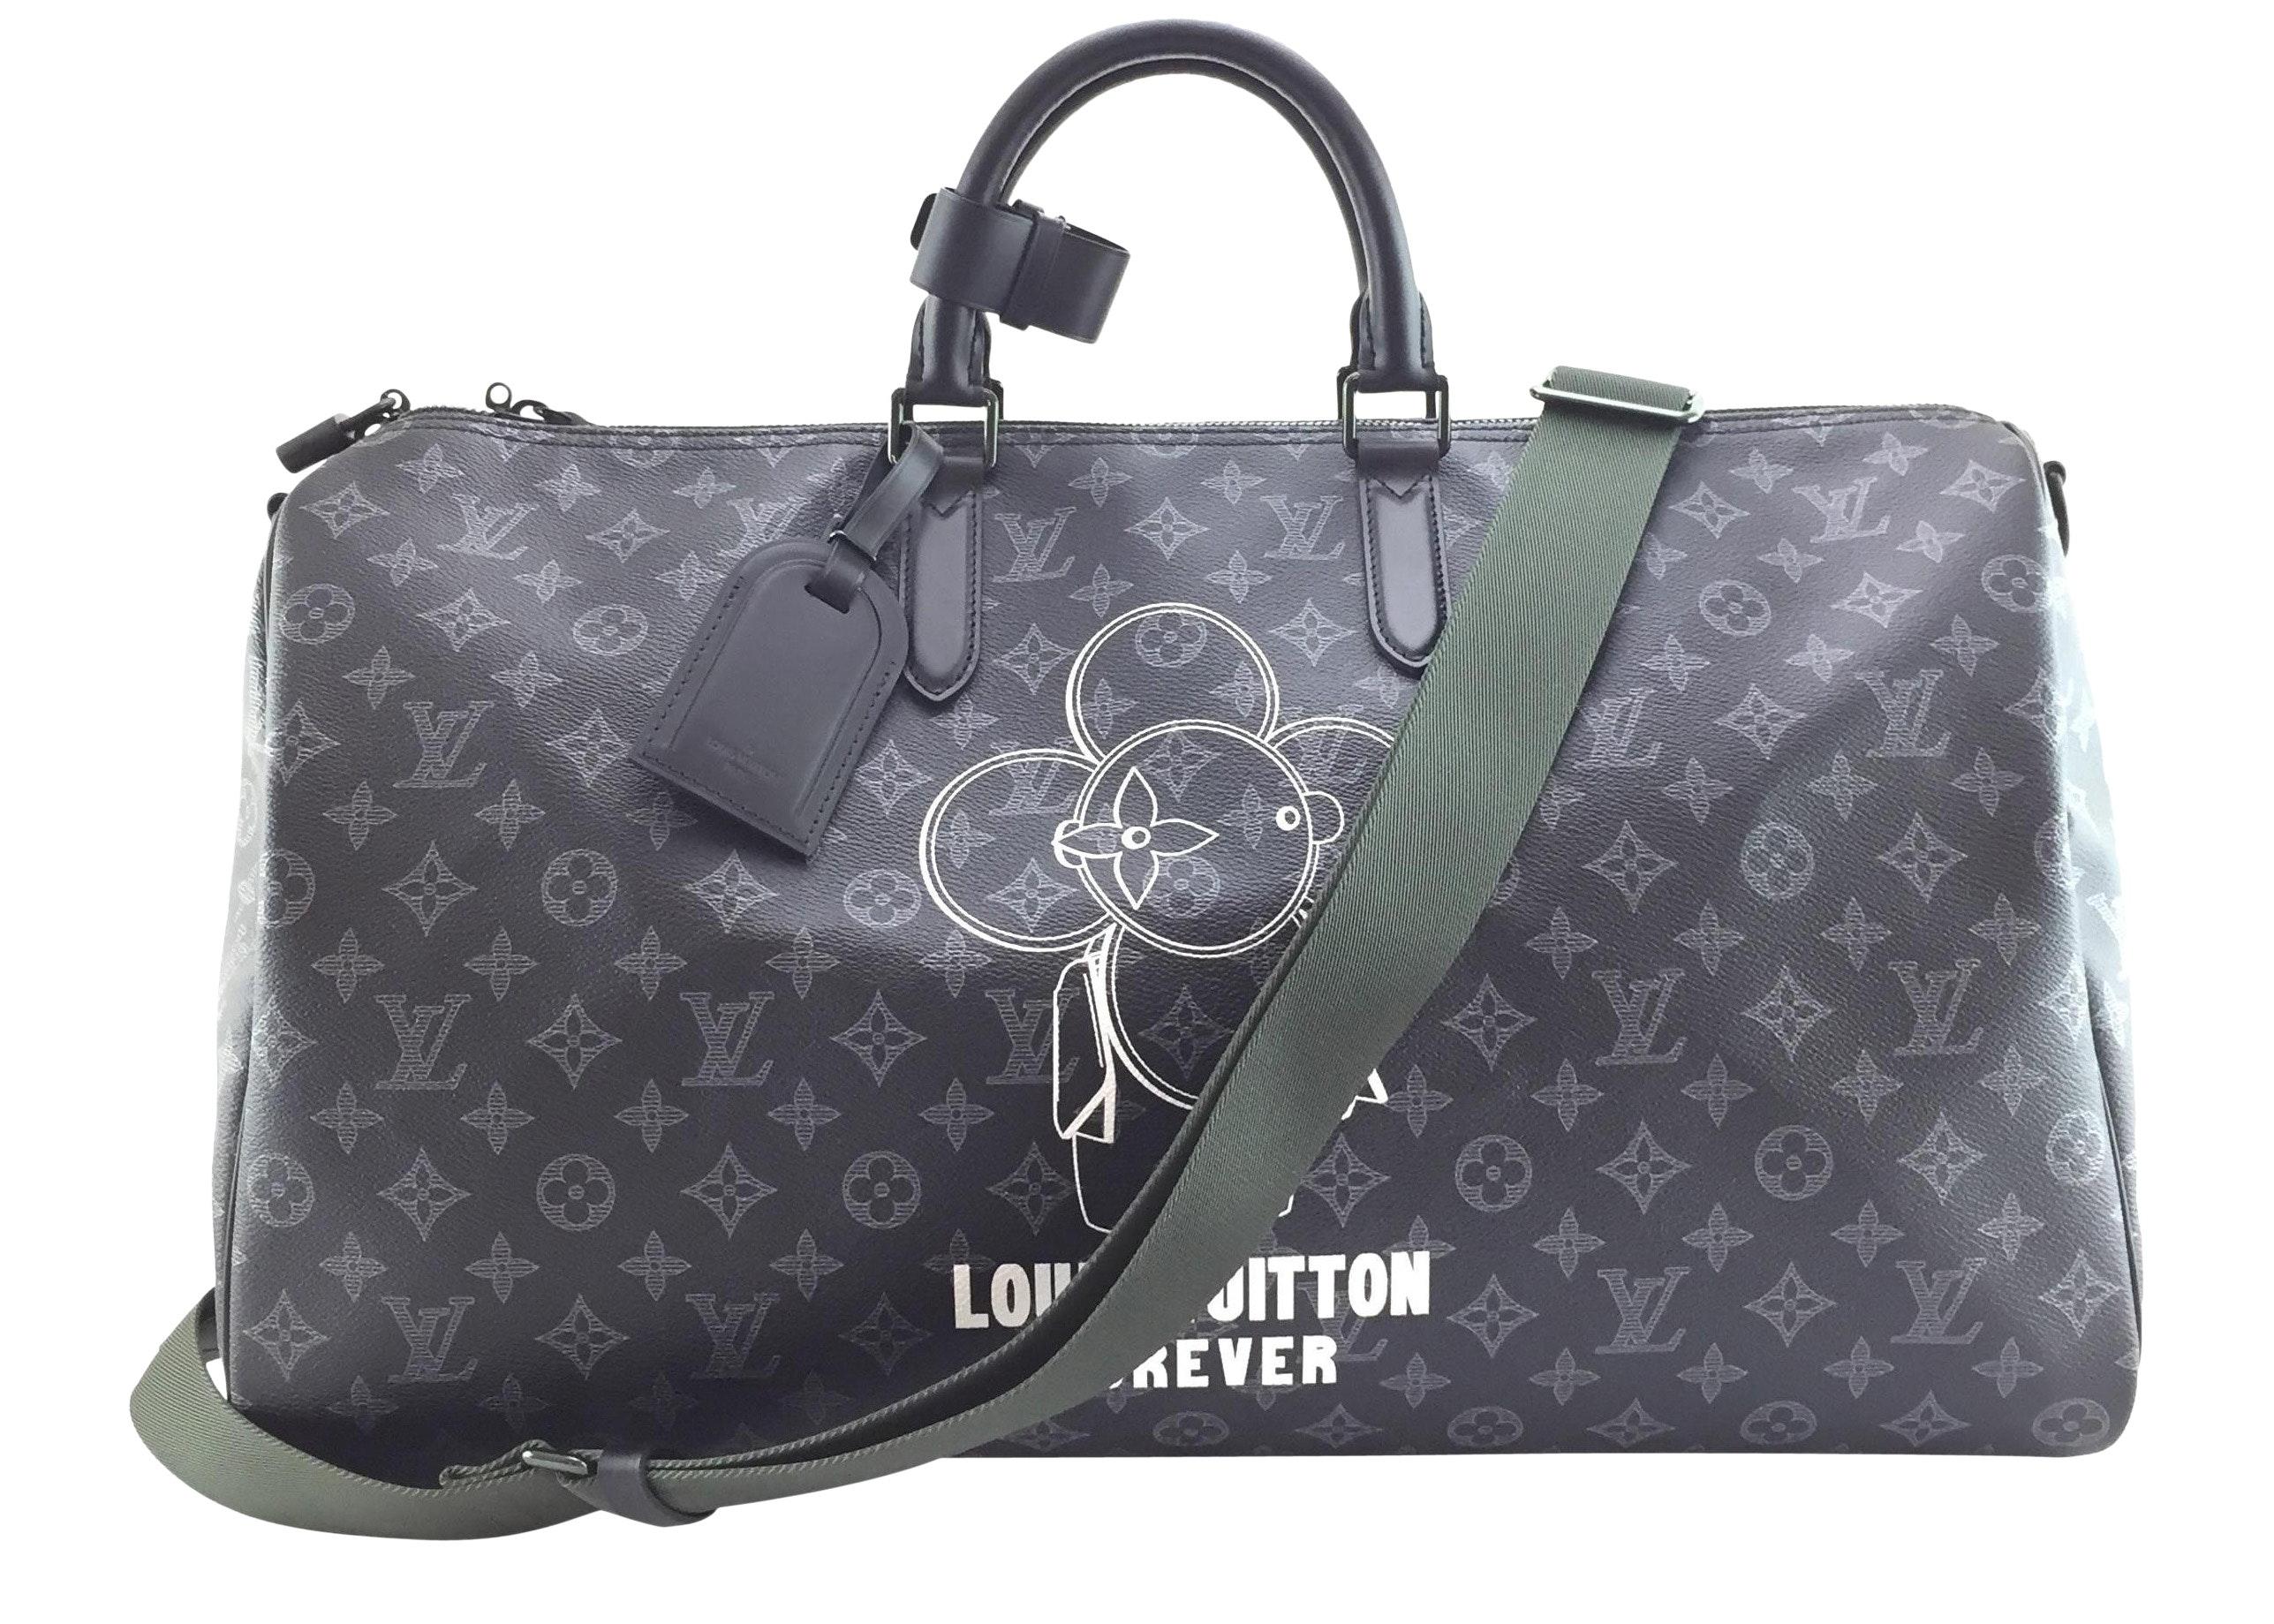 Louis Vuitton Keepall Bandouliere Monogram Vivienne Logo 50 Black